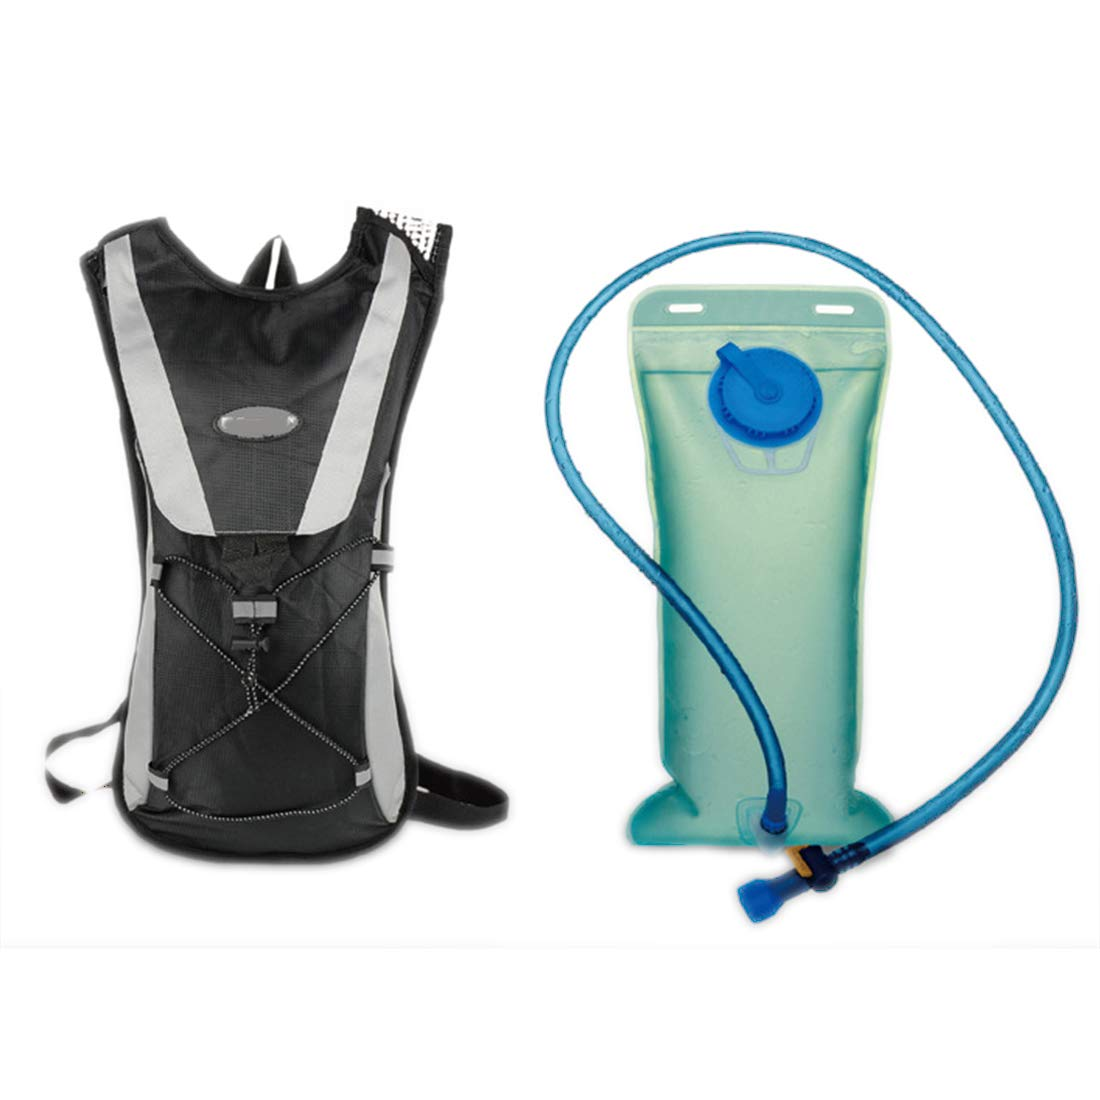 Massun Cycling Bike Bicycle Backpack for Storage Water Bag Bladder